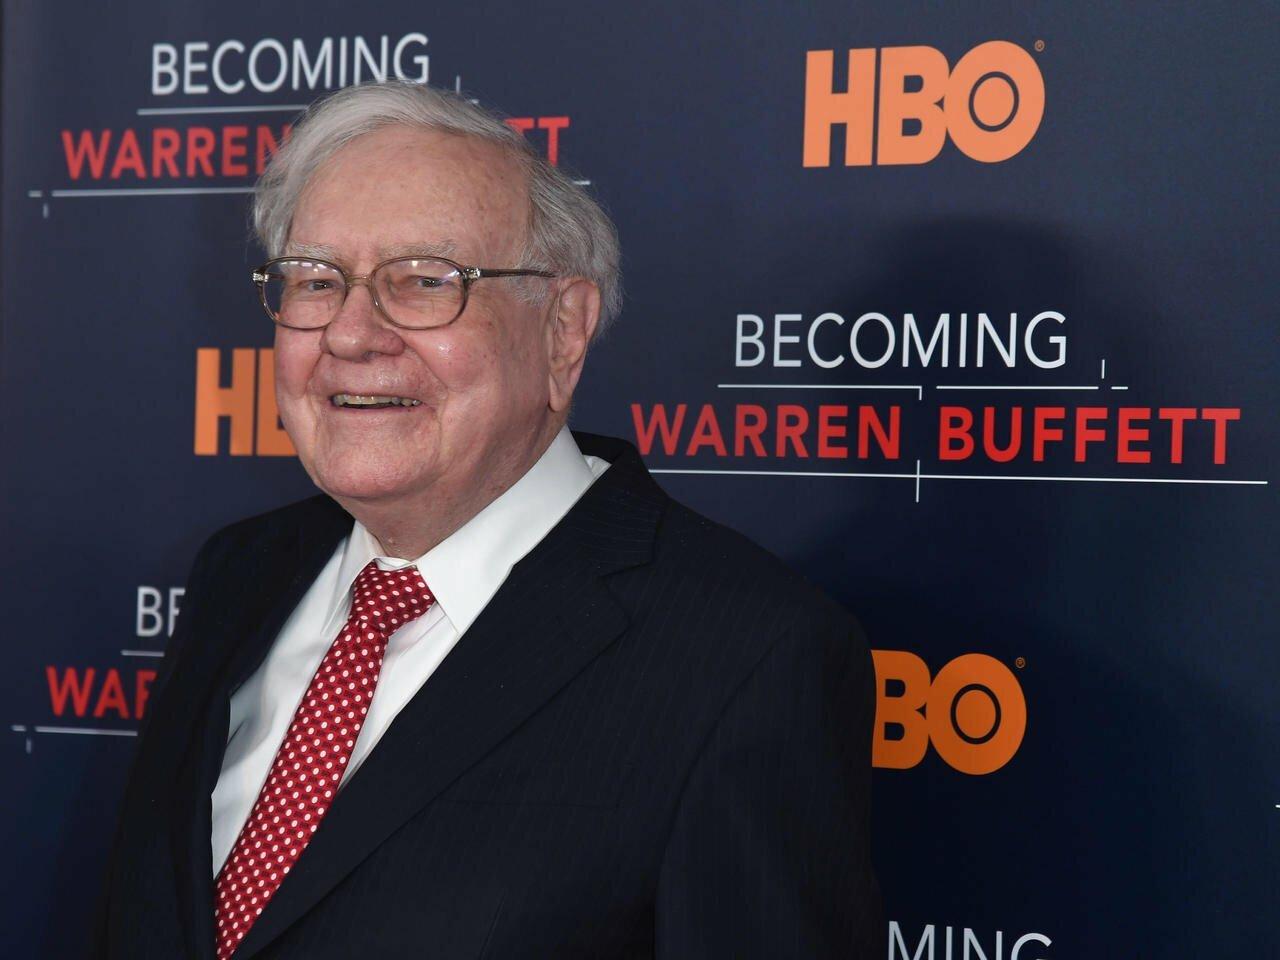 Warren Buffet just gave away Sh280 billion to charity in one year